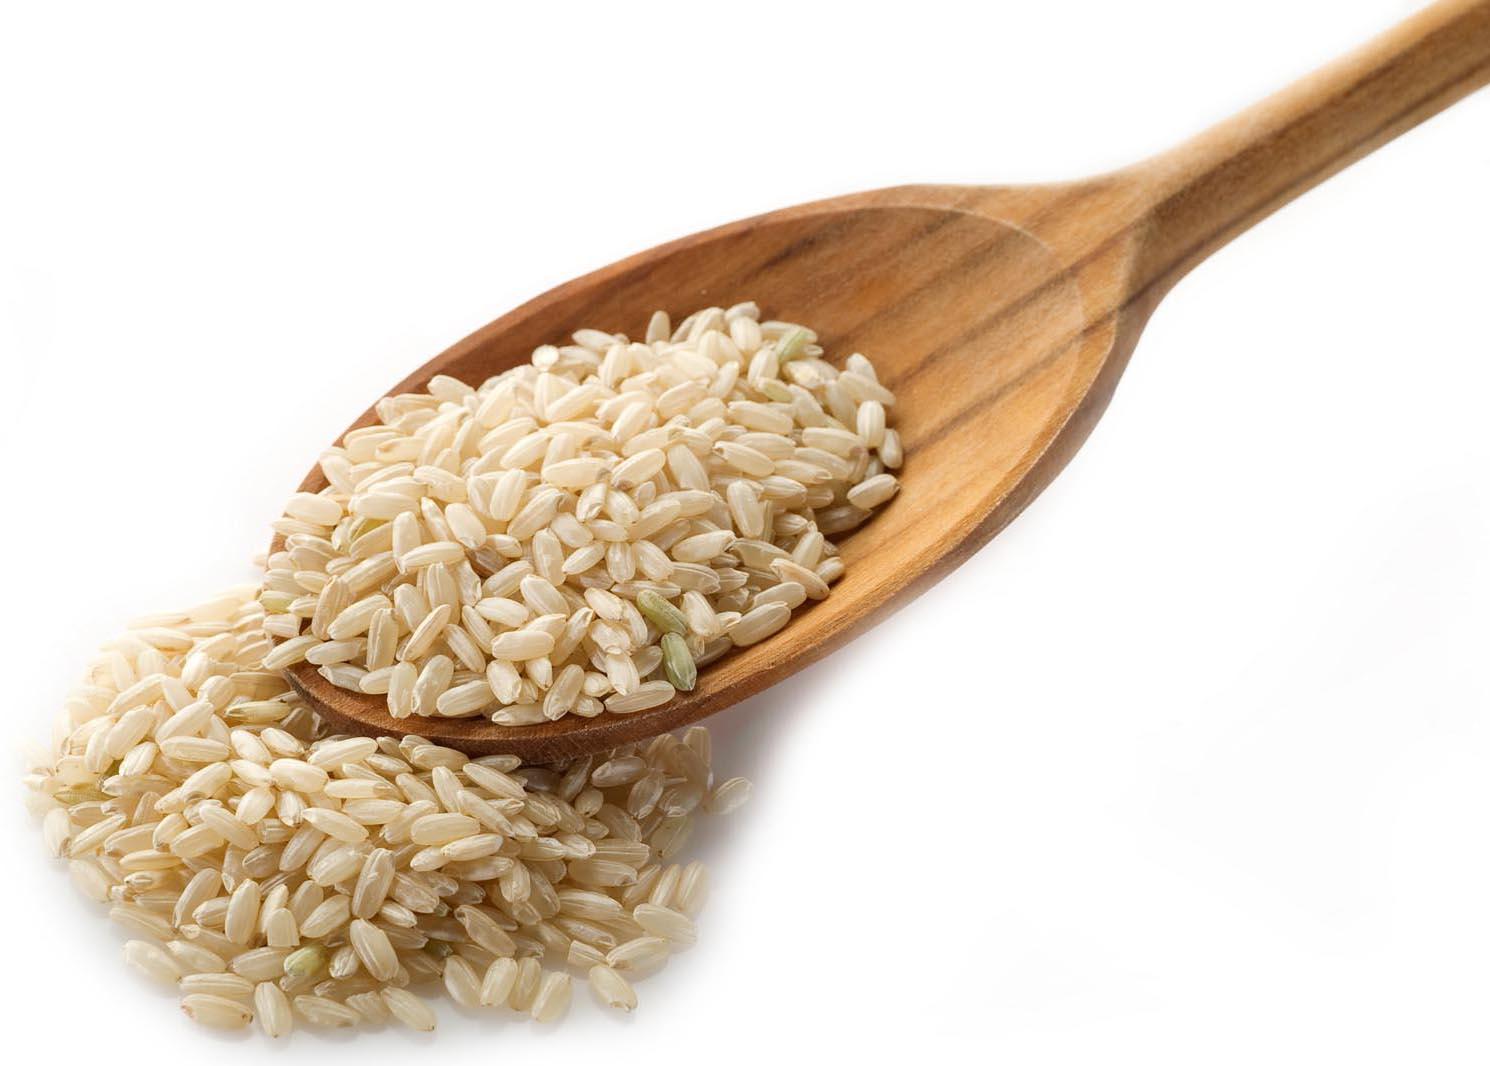 Pirinç suyunun kullanım alanları